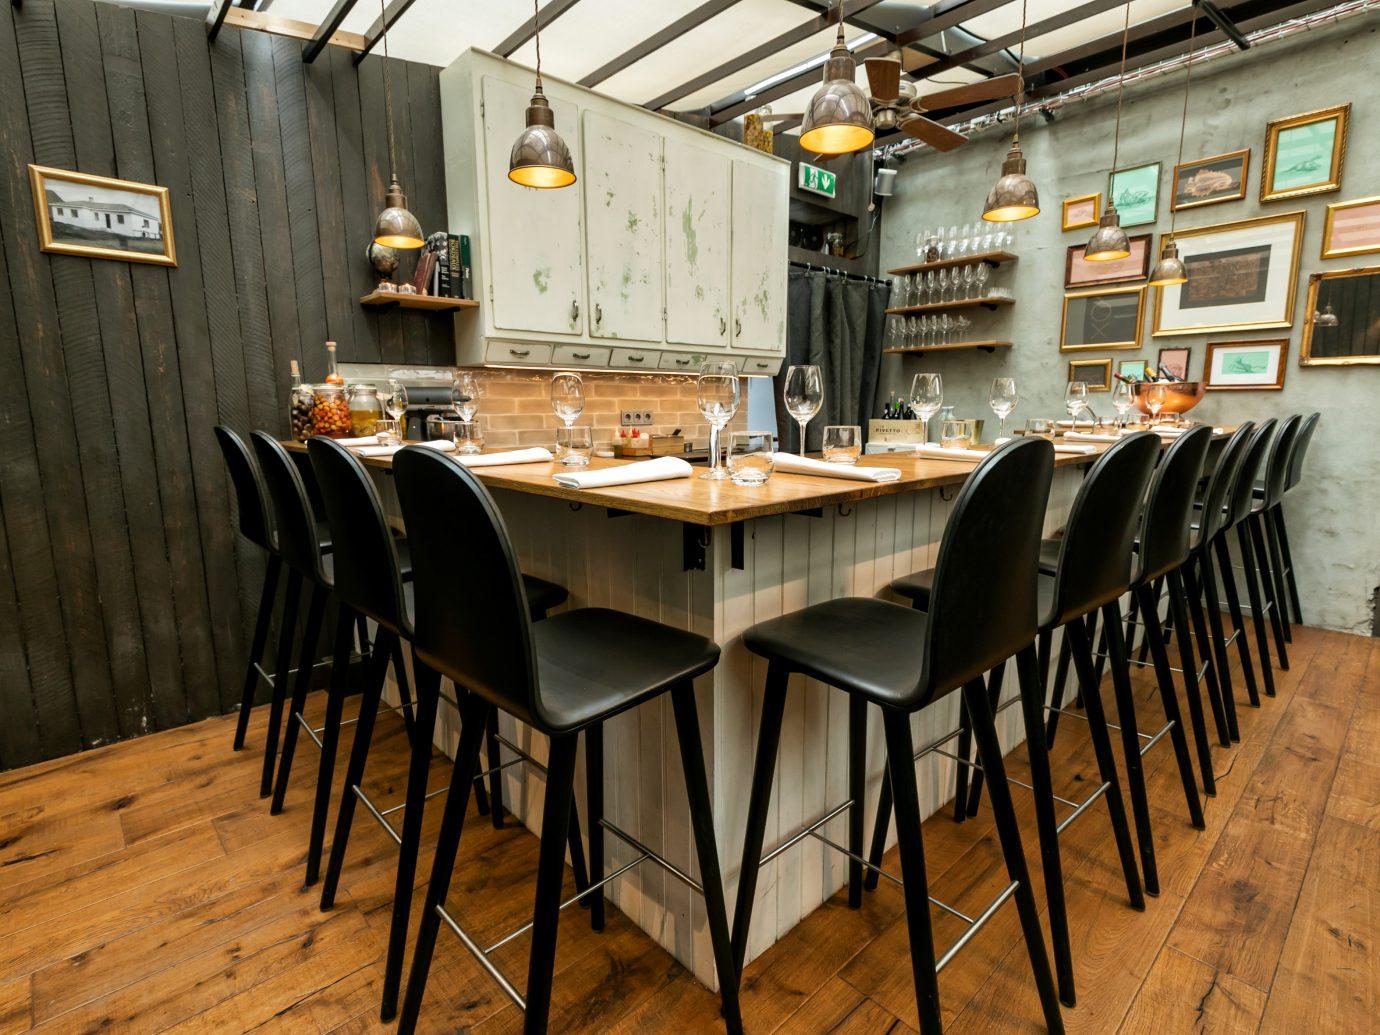 table at OX restaurant in Reykjavik Iceland